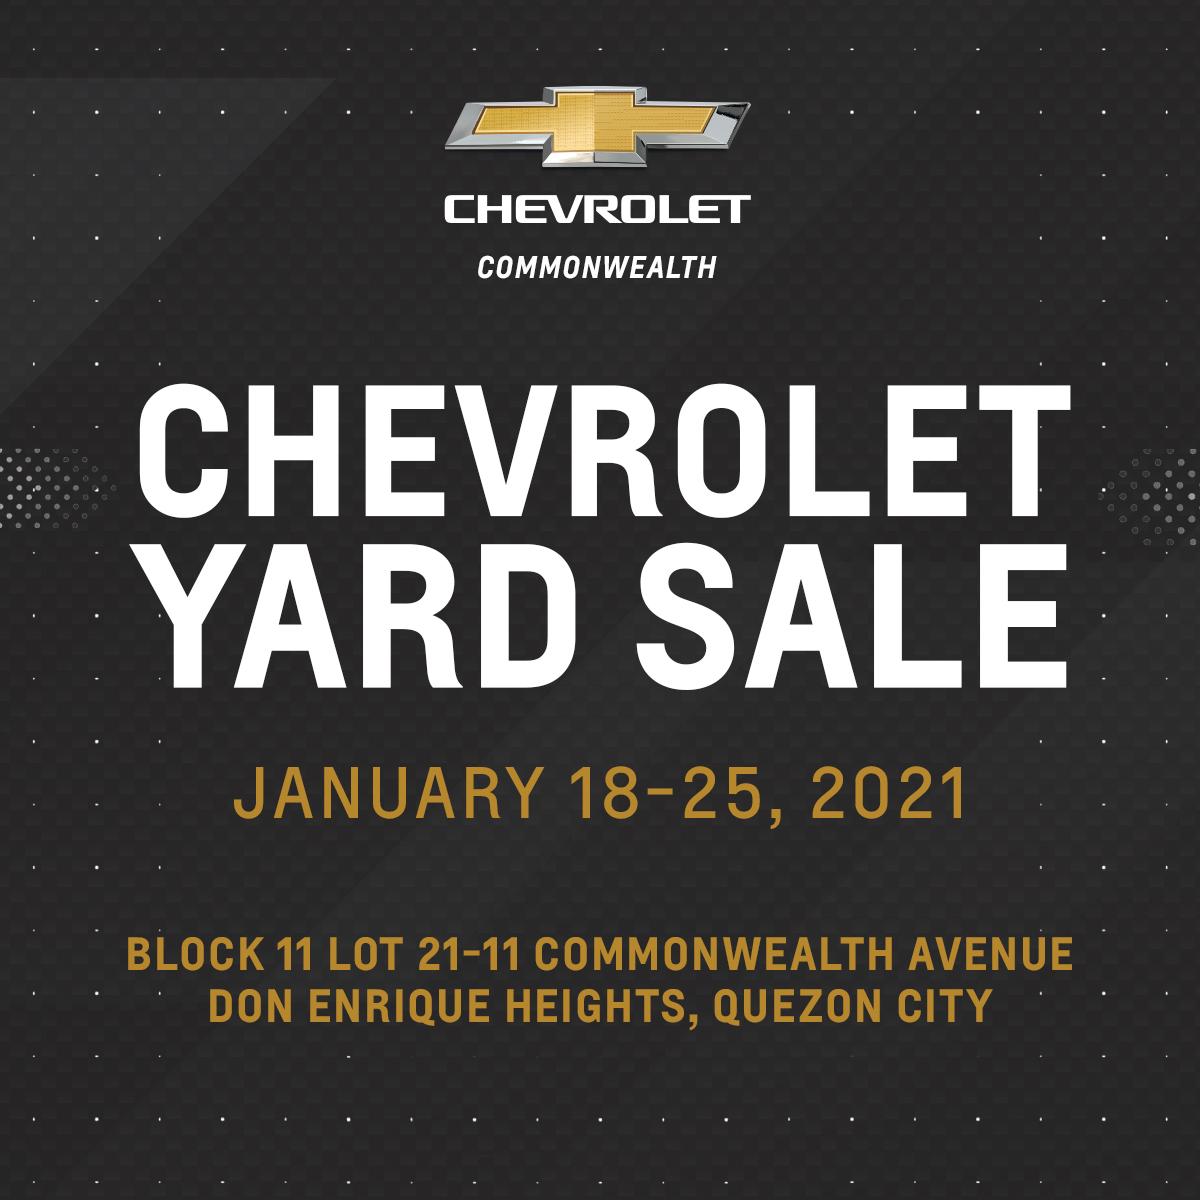 Chevrolet Yard sale